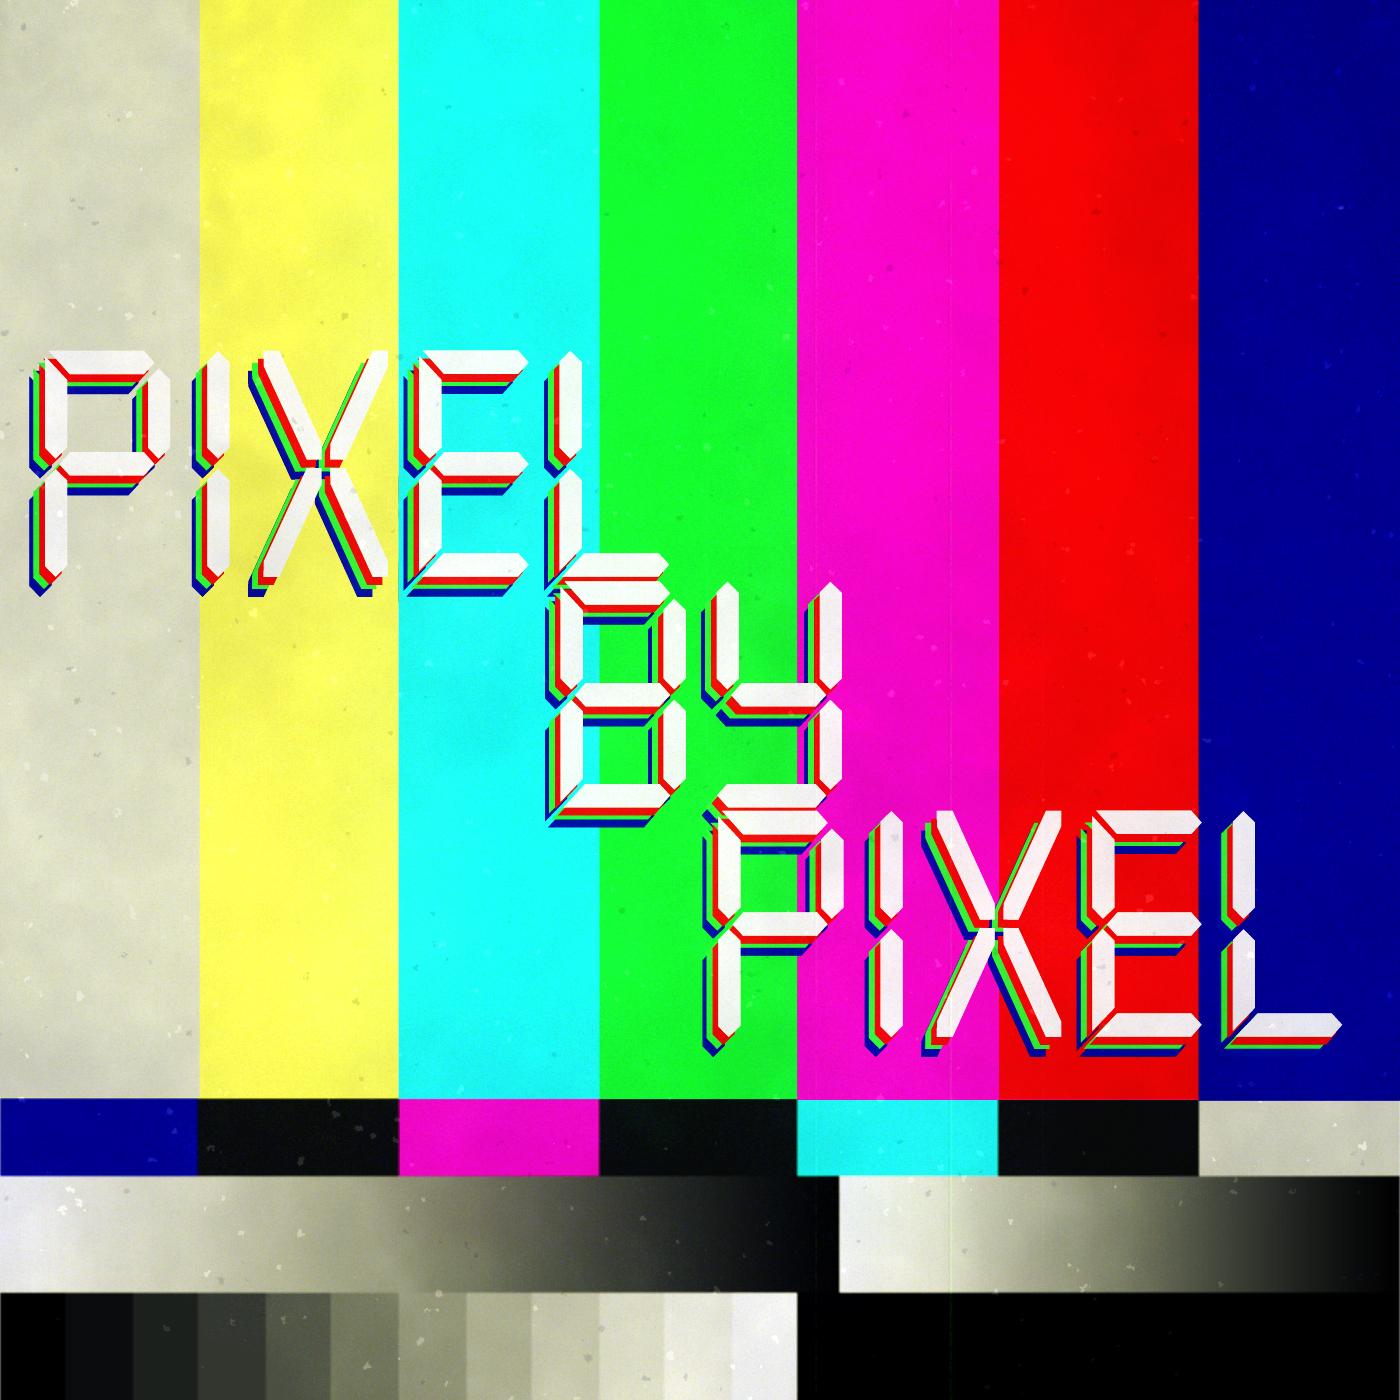 Pixel by Pixel - Episode 2 - We Enjoydish Spec Ops